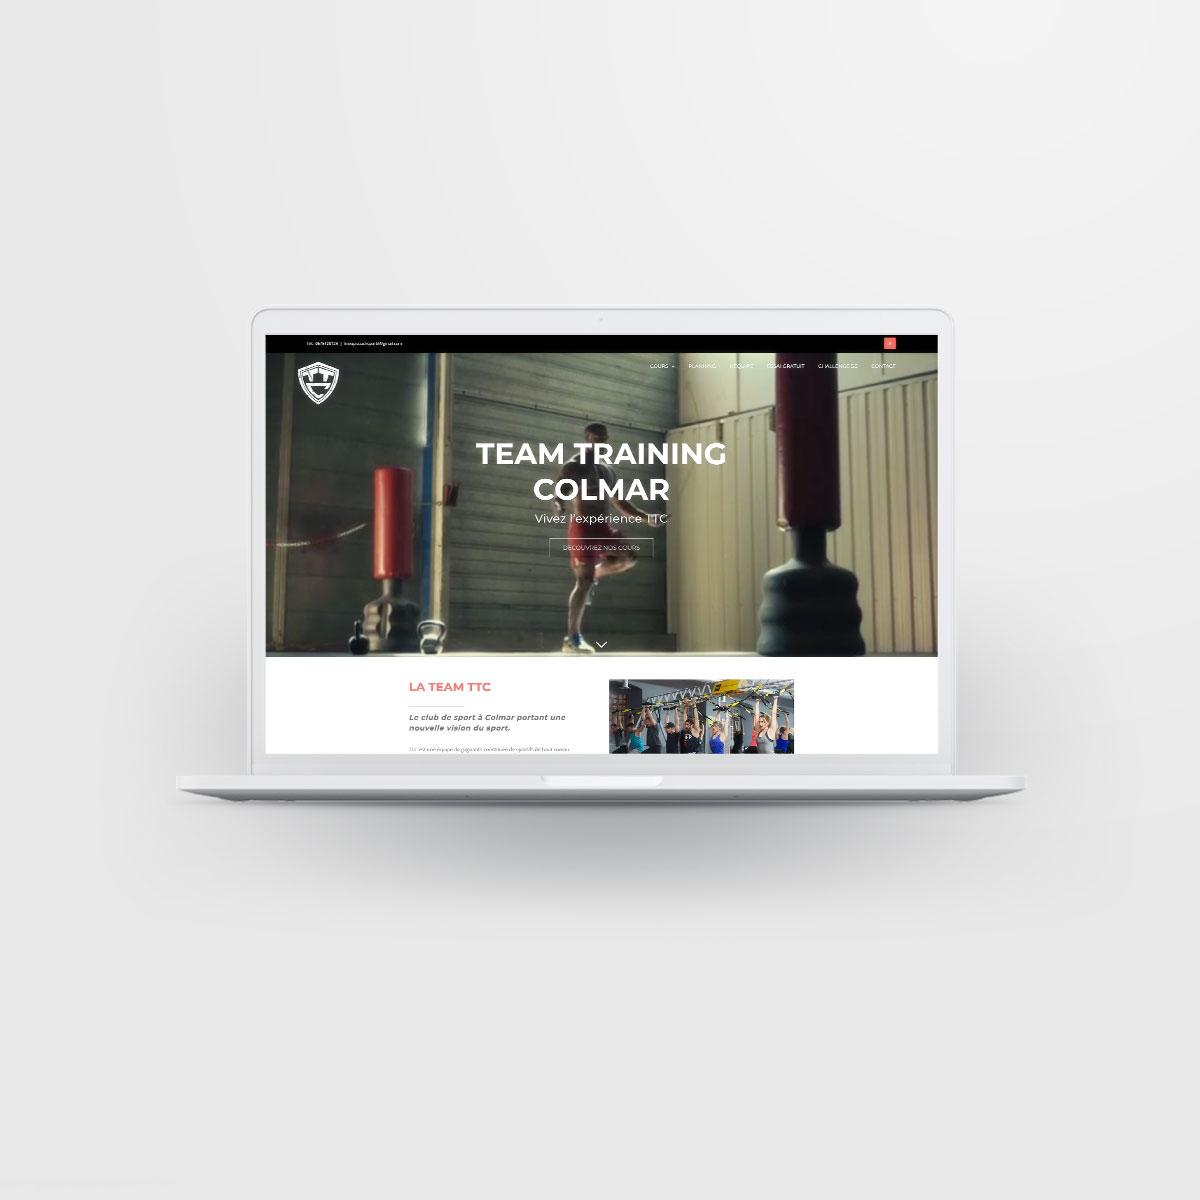 Team Training Colmar website